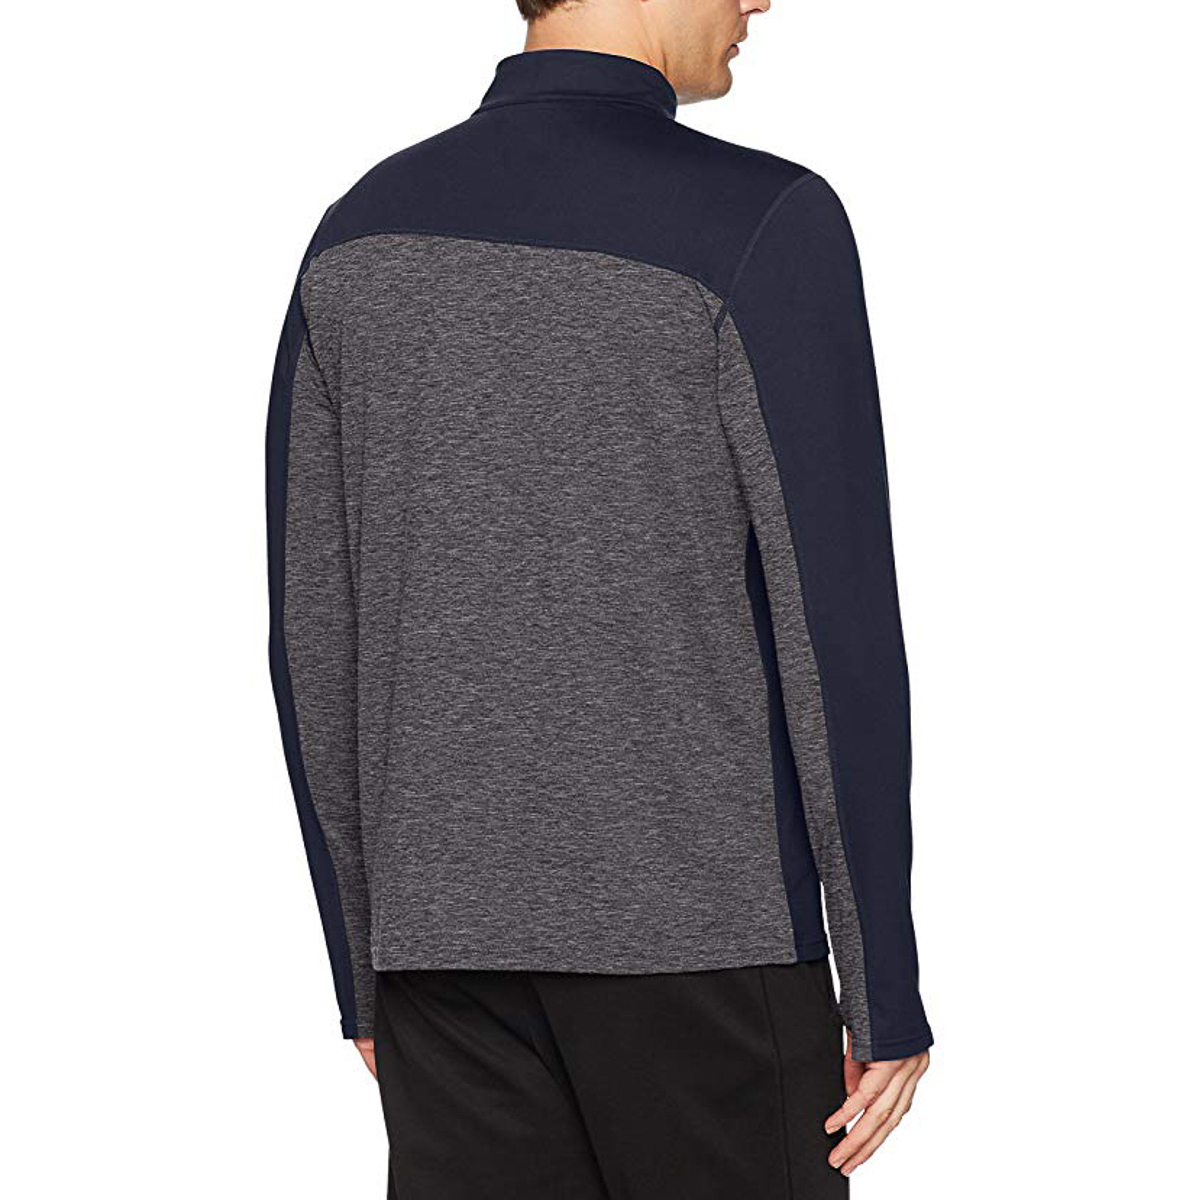 Asics-Sports-Half-Zip-Long-Sleeve-Pullover-Athletic-Men-s-Shirt-Motion-Dry-Tech thumbnail 9